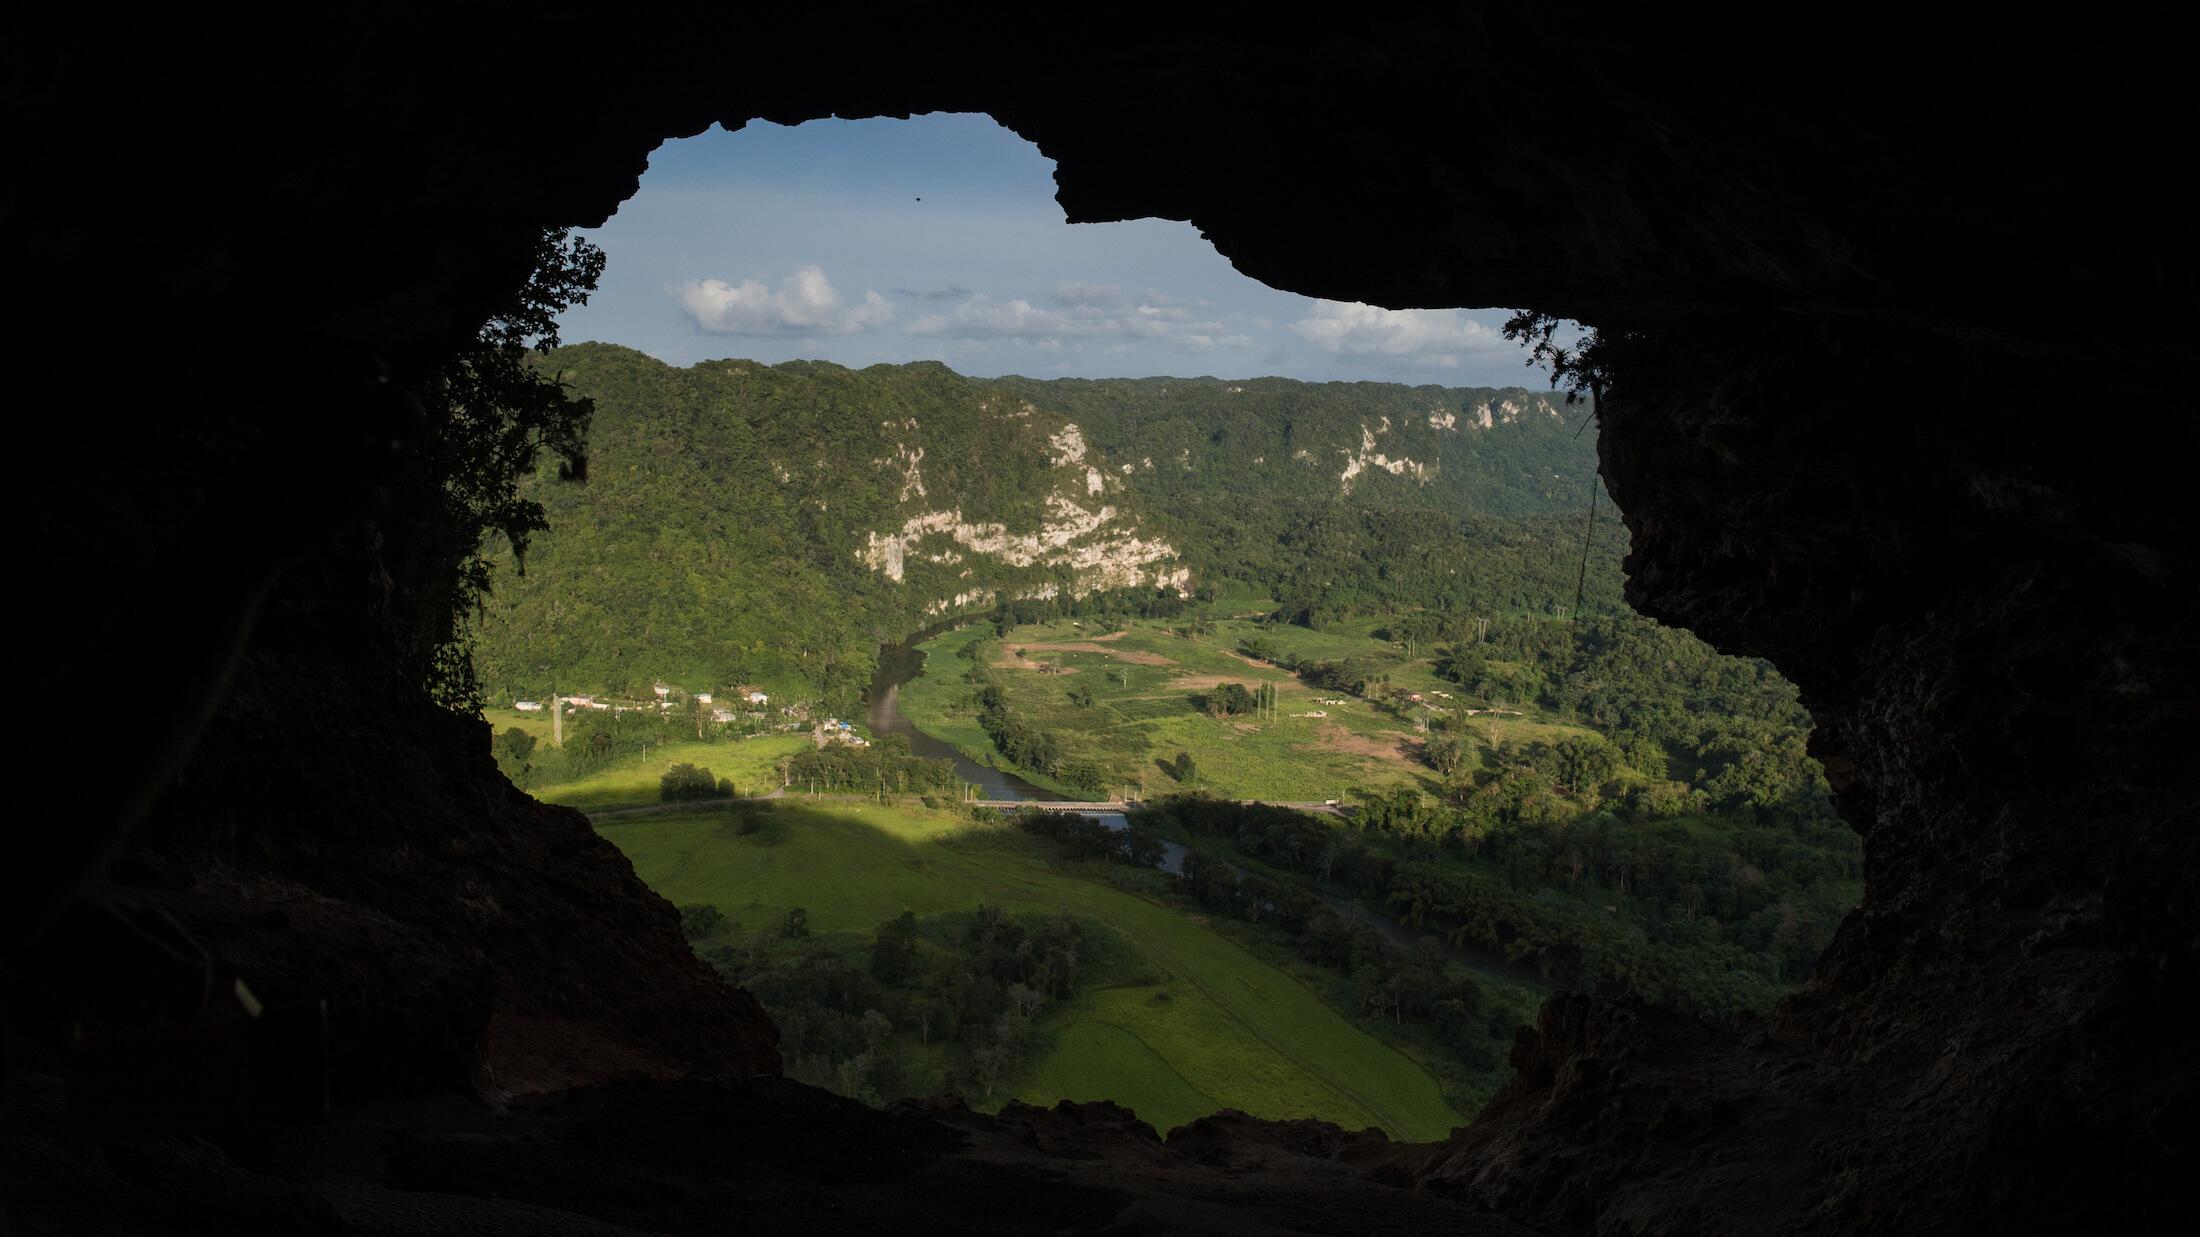 engle-olson-photography-puerto-rico-10.jpg